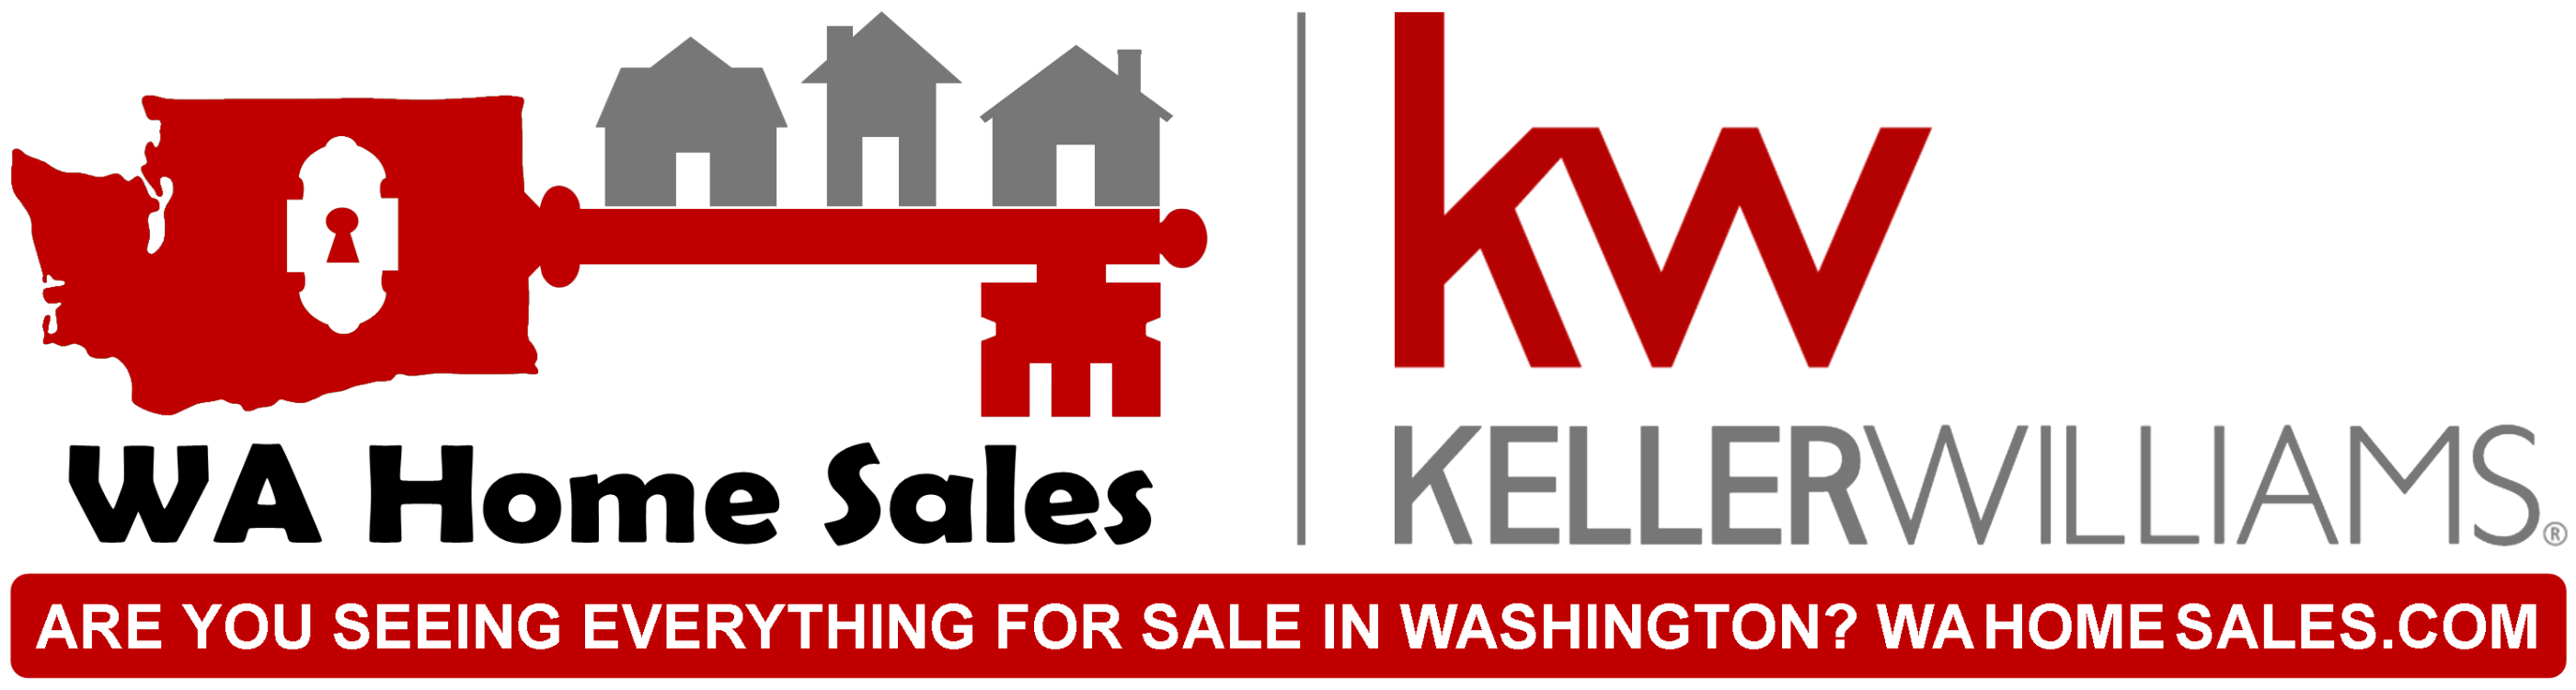 Washington Home Sales